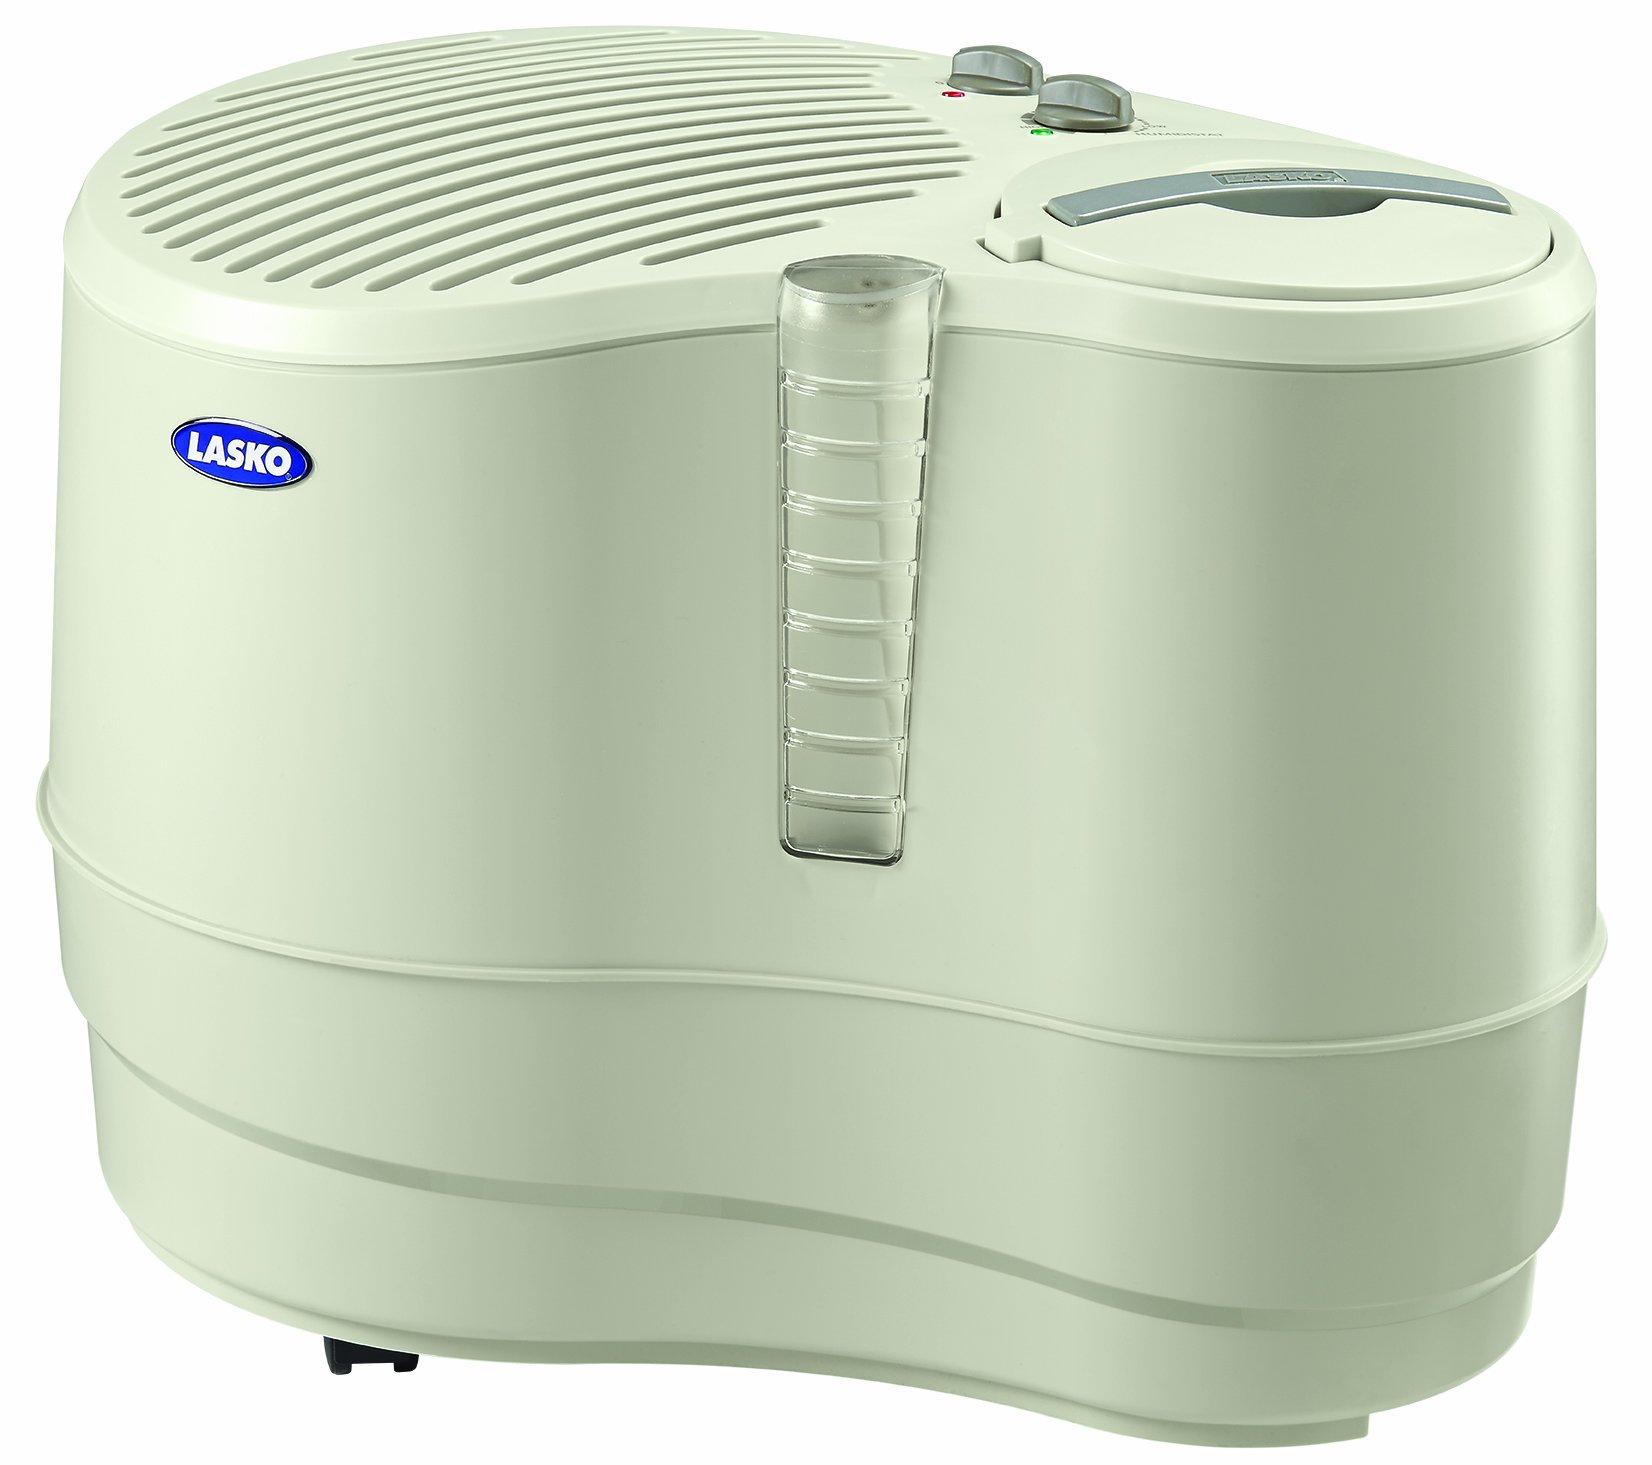 Lasko 1128 Evaporative Recirculating Humidifier, 9-Gallon